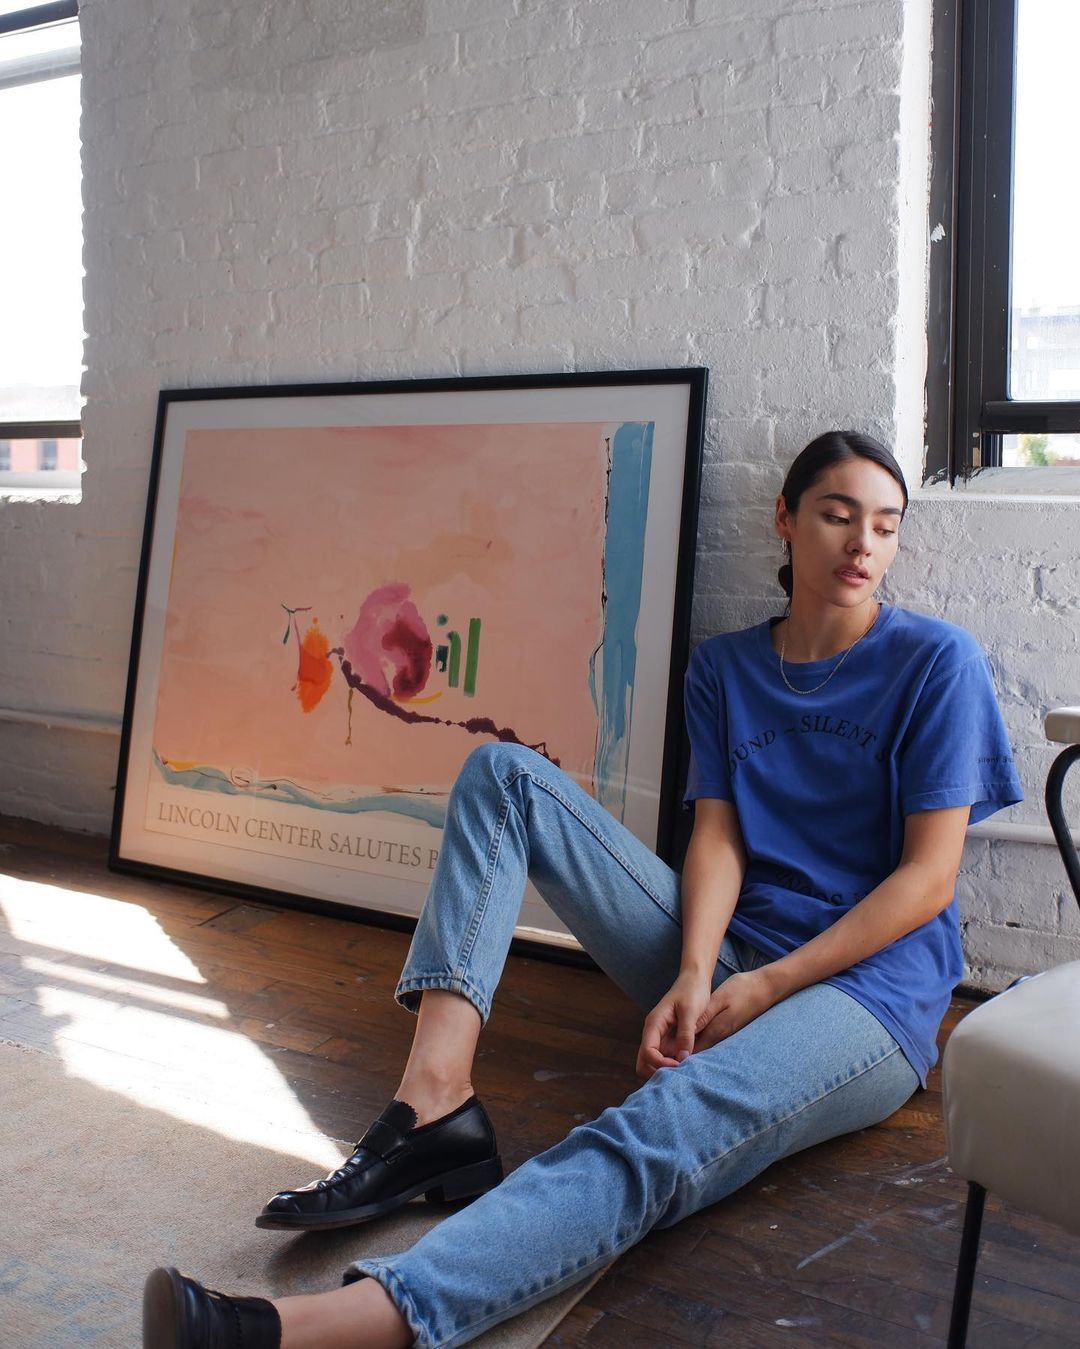 Kaitlyn-Fitzpatrick-Wallpapers-Insta-Fit-Bio-5